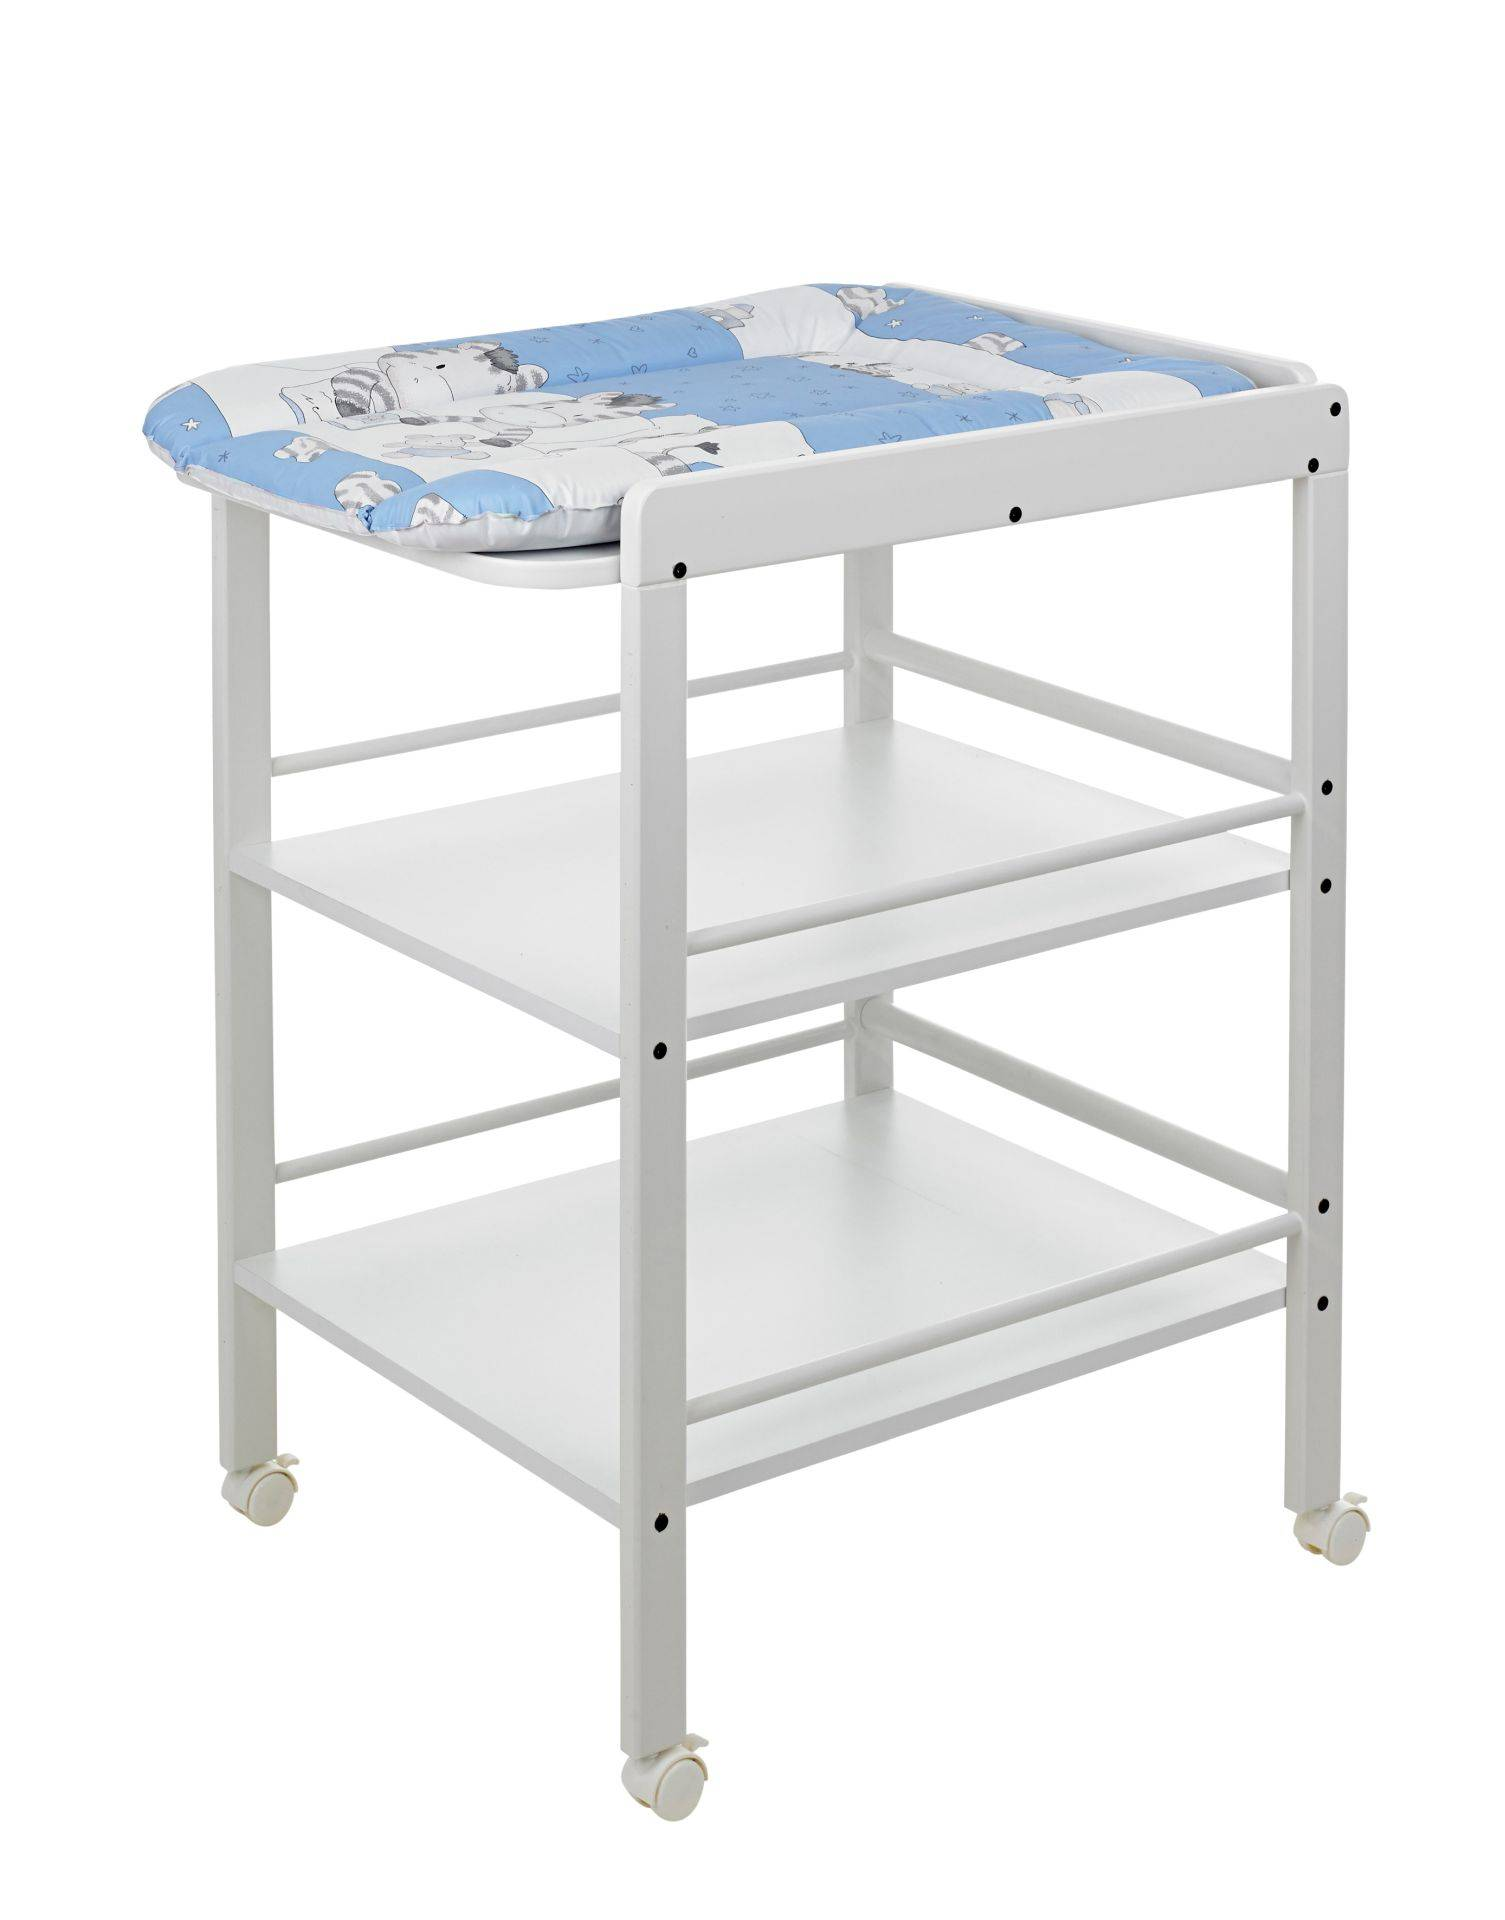 Geuther Table à langer Clarissa - Weiß